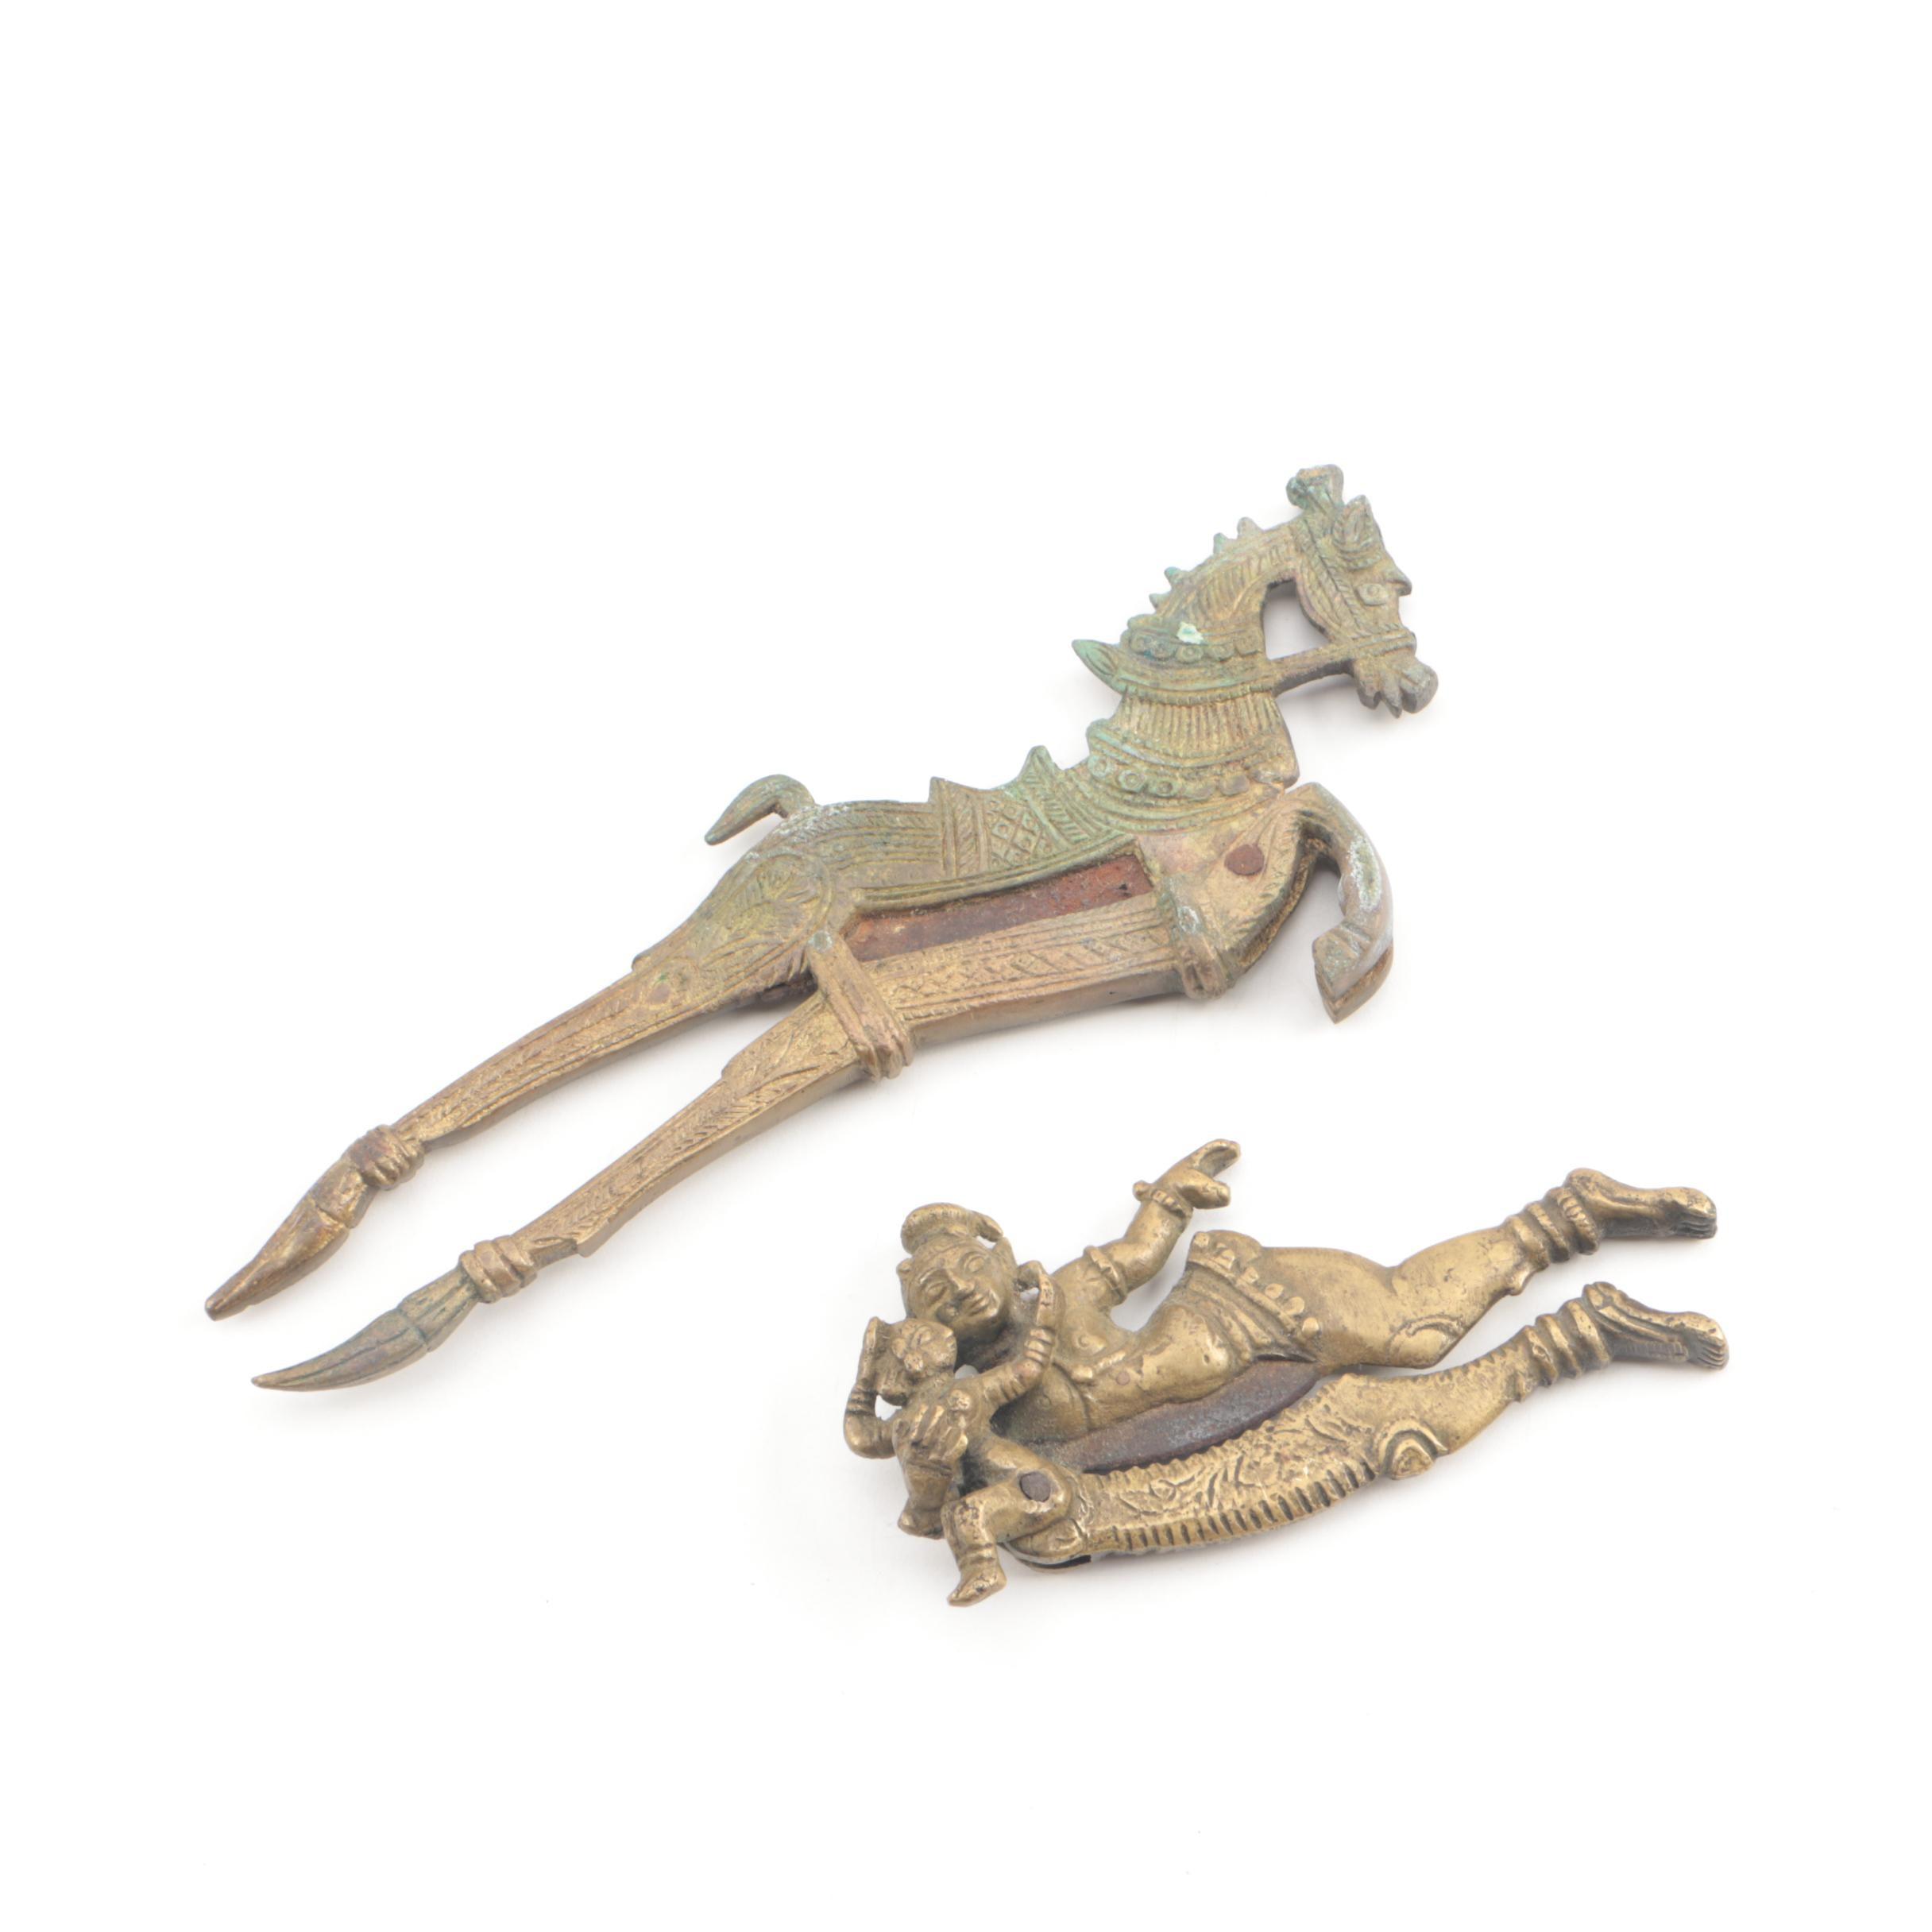 Vintage South Asian Figural Brass Nutcrackers